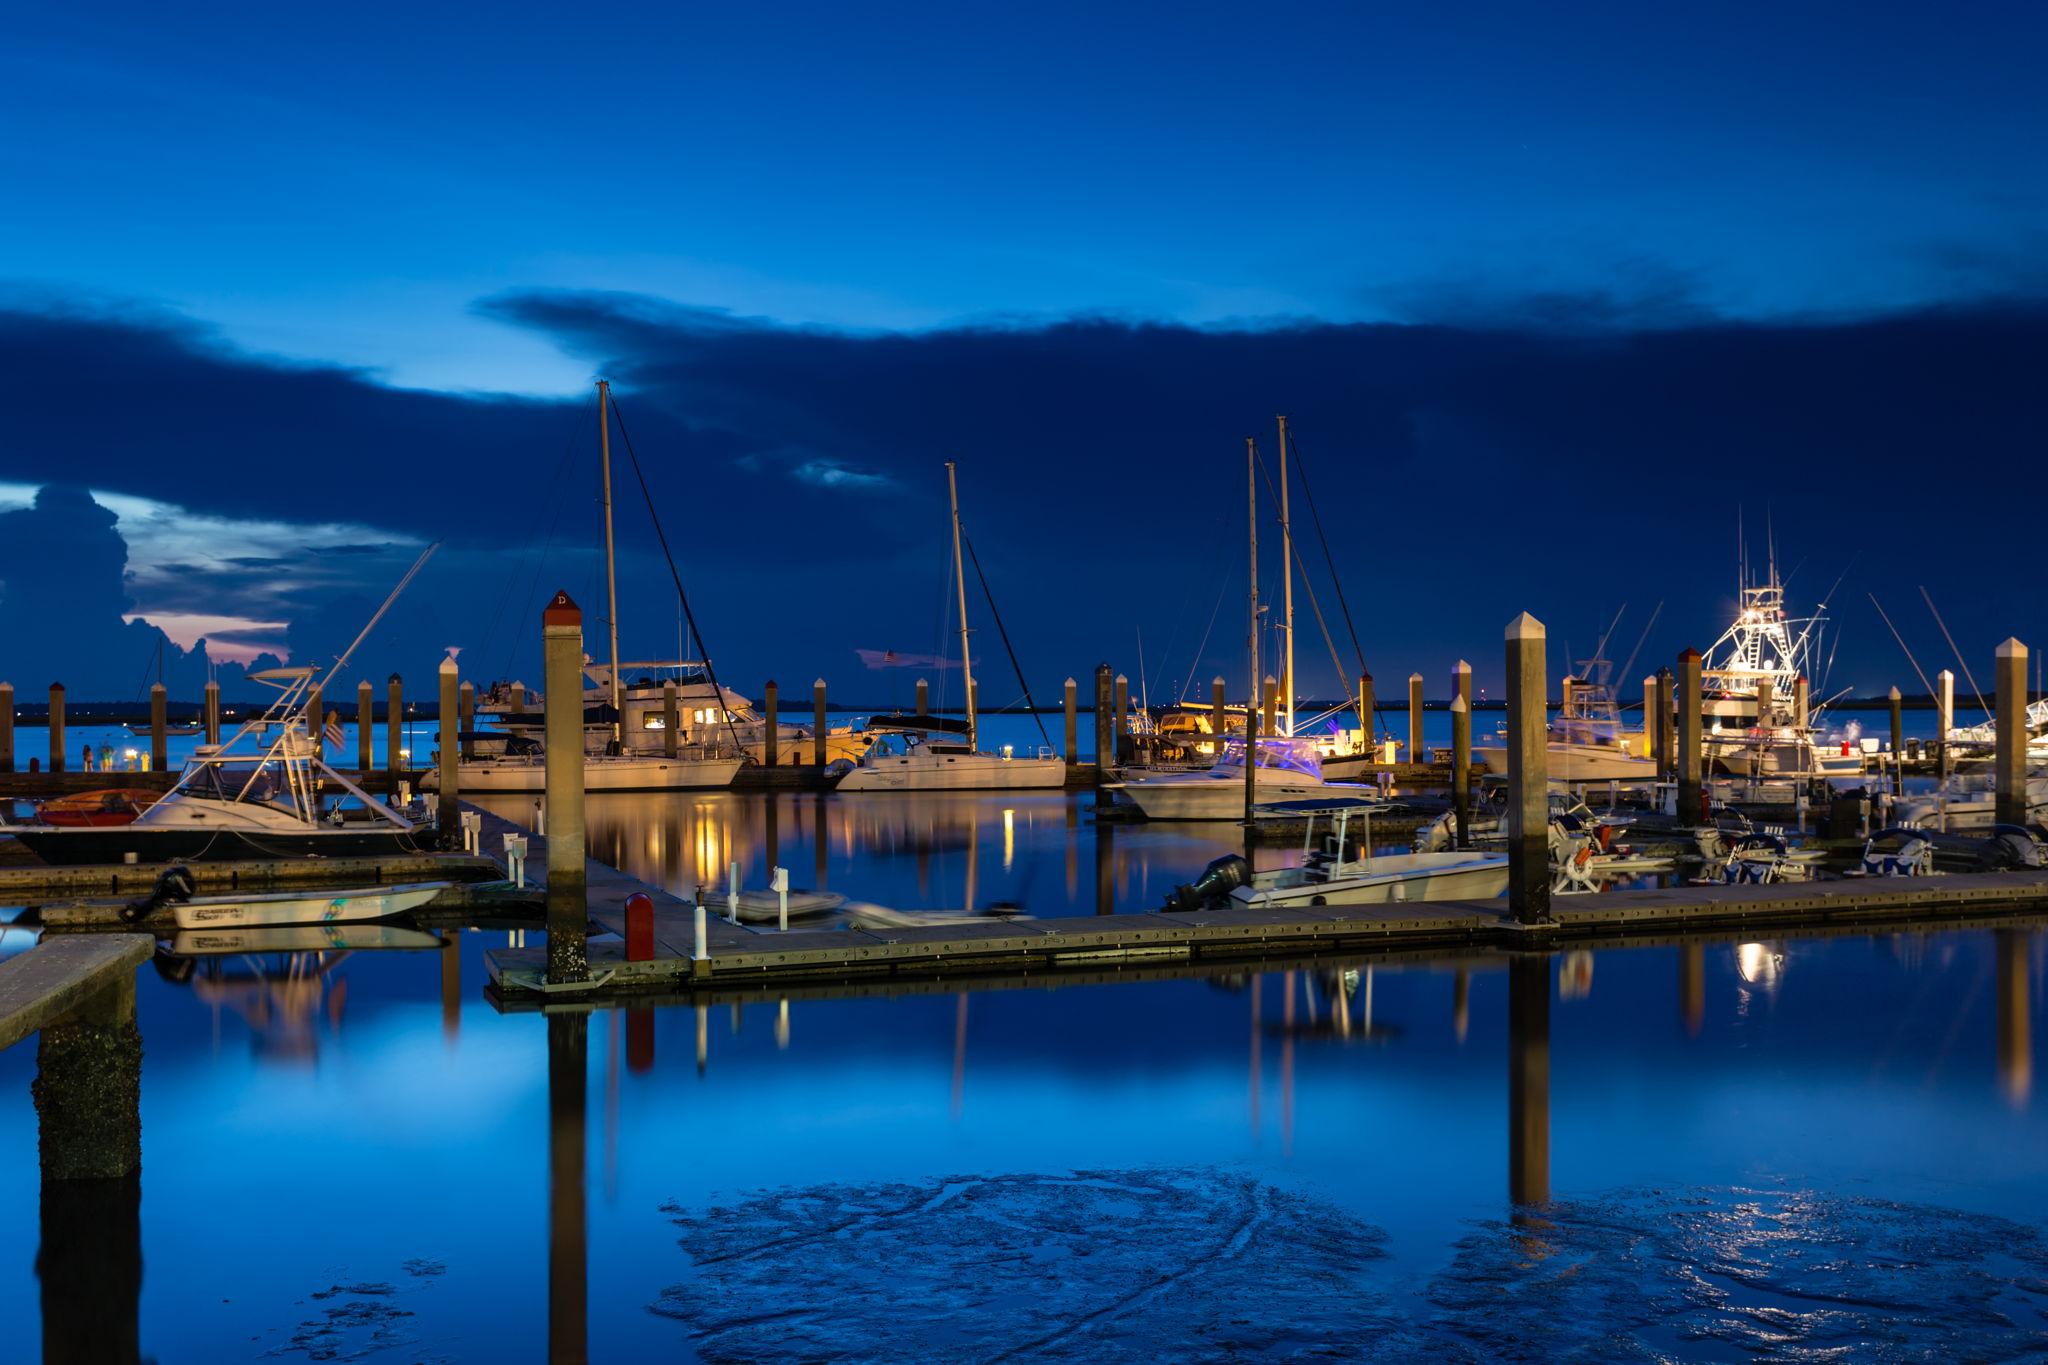 Fernandina harbor and marina, stunning day or night